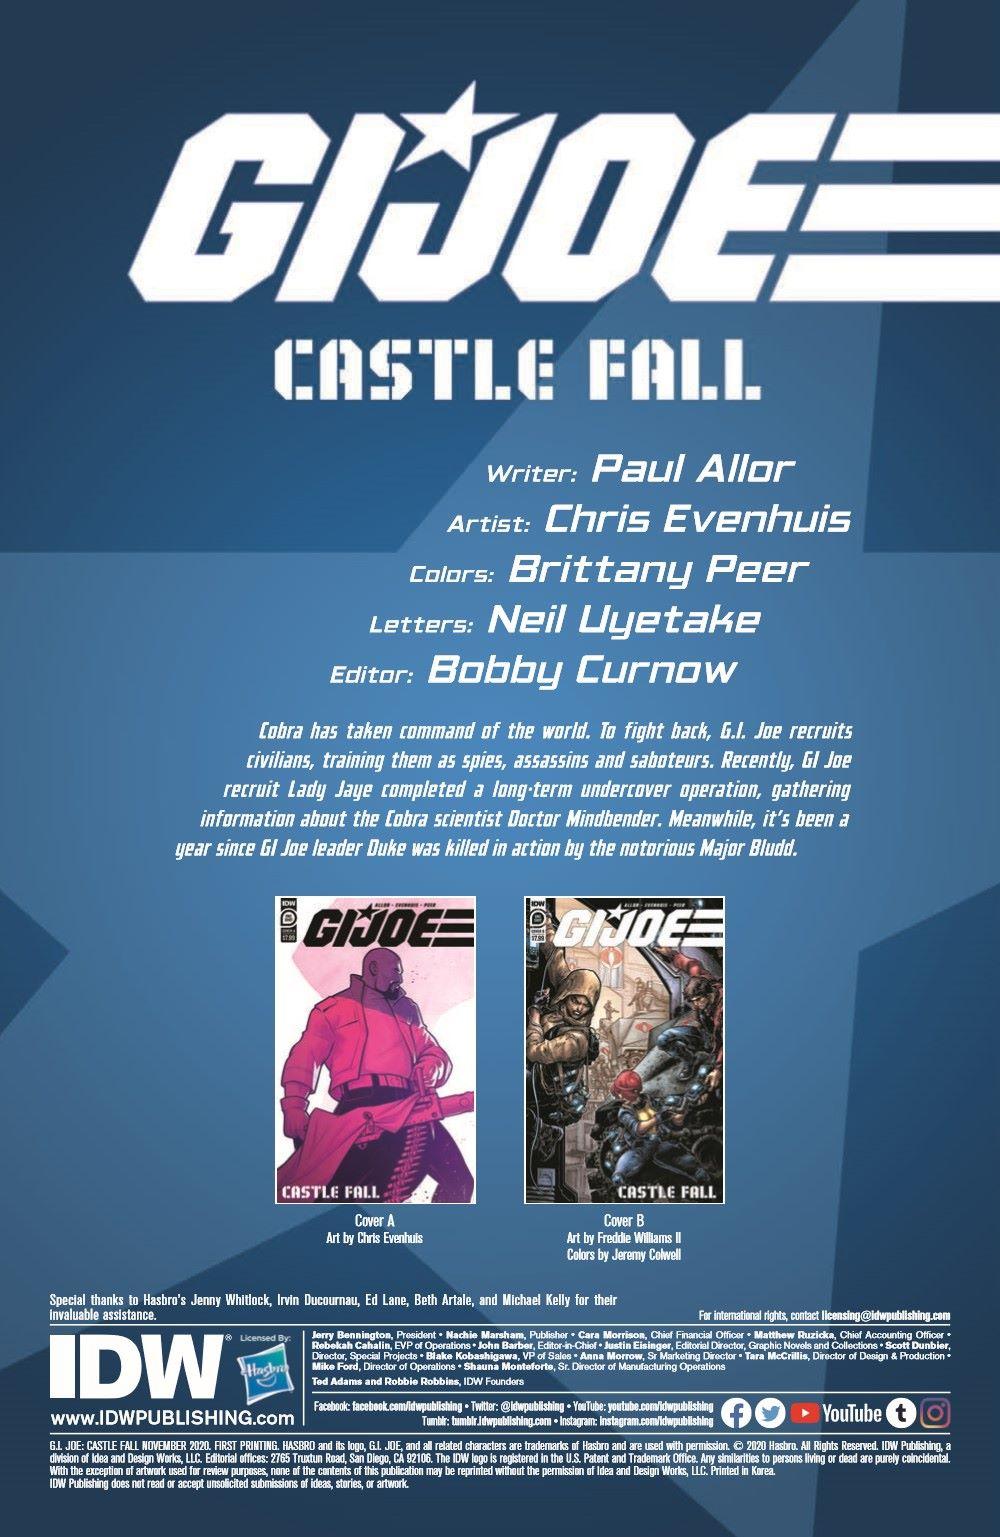 GIJoe_CastleFall-pr-2 ComicList Previews: G.I. JOE CASTLE FALL #1